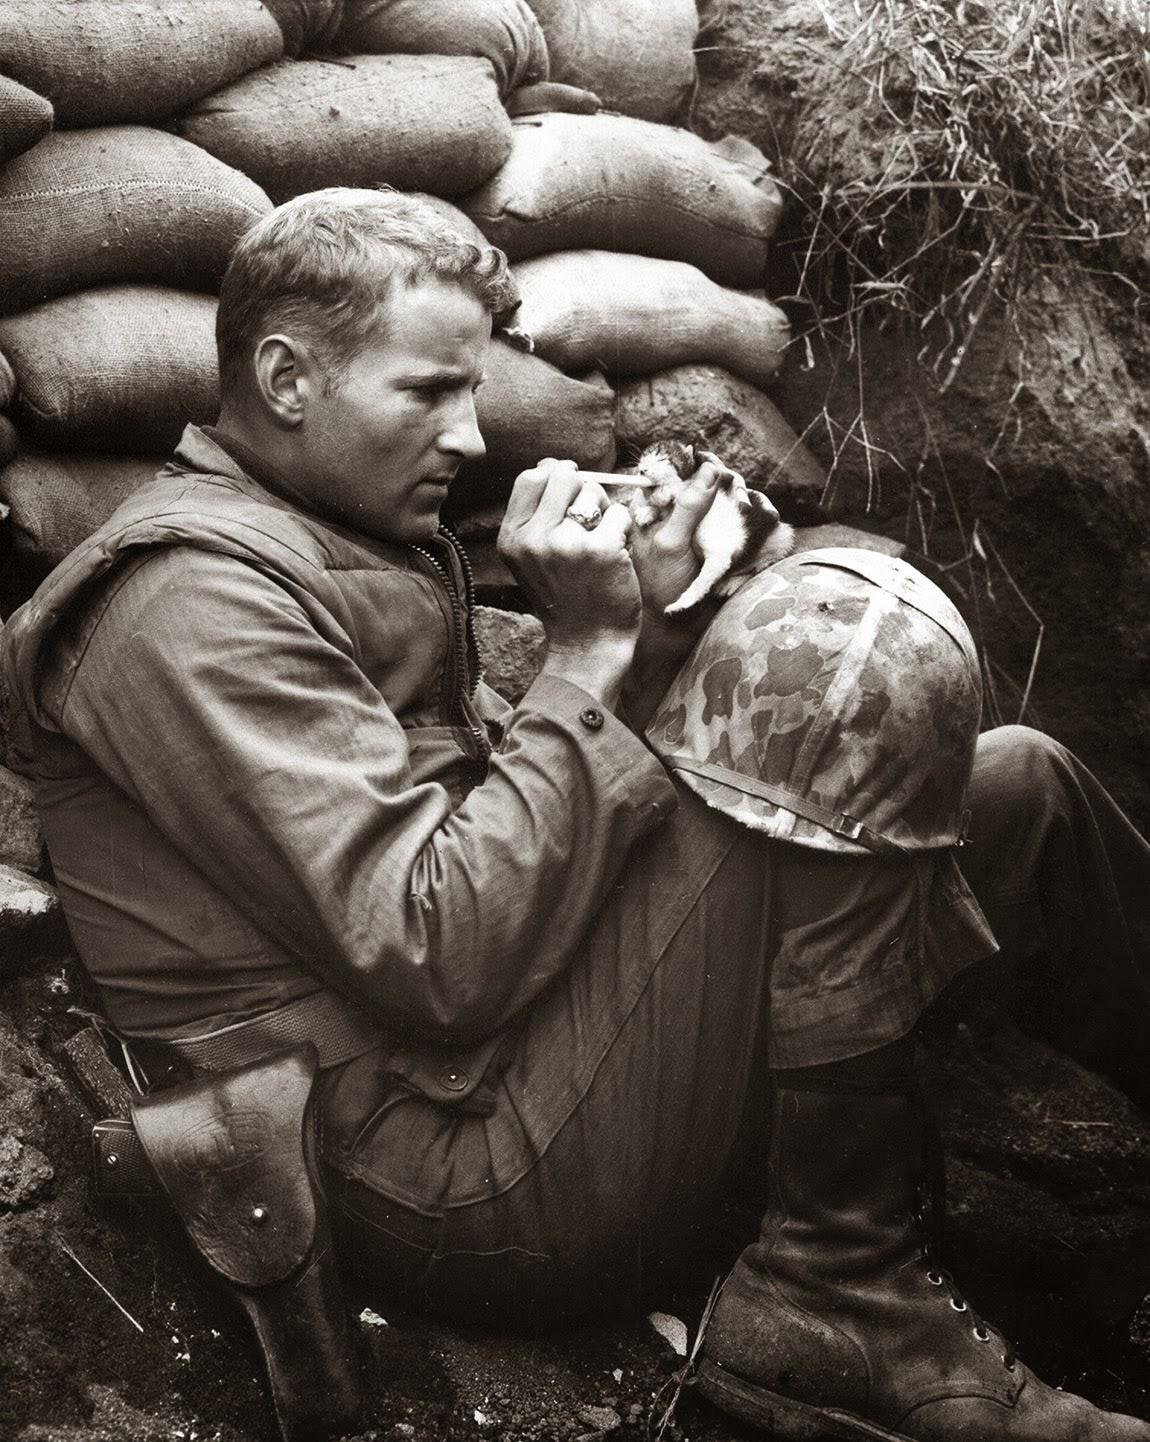 The marine and the kitten, Korean War, 1952 (1)